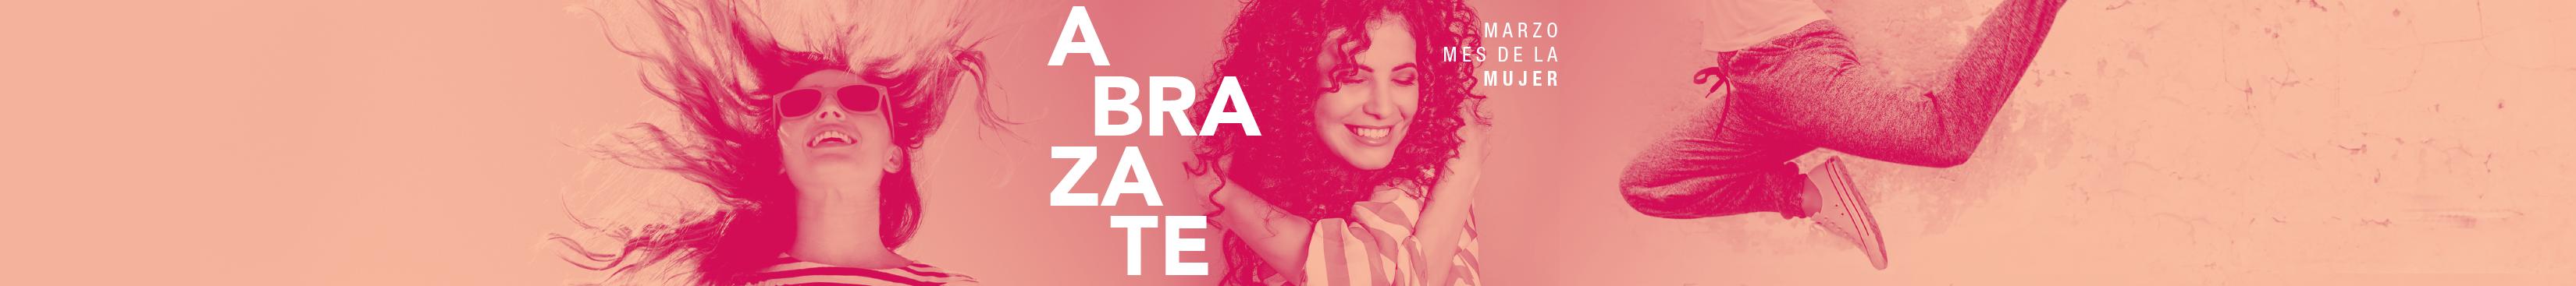 Banner-Web_Mes-de-la-mujer_Abrazate